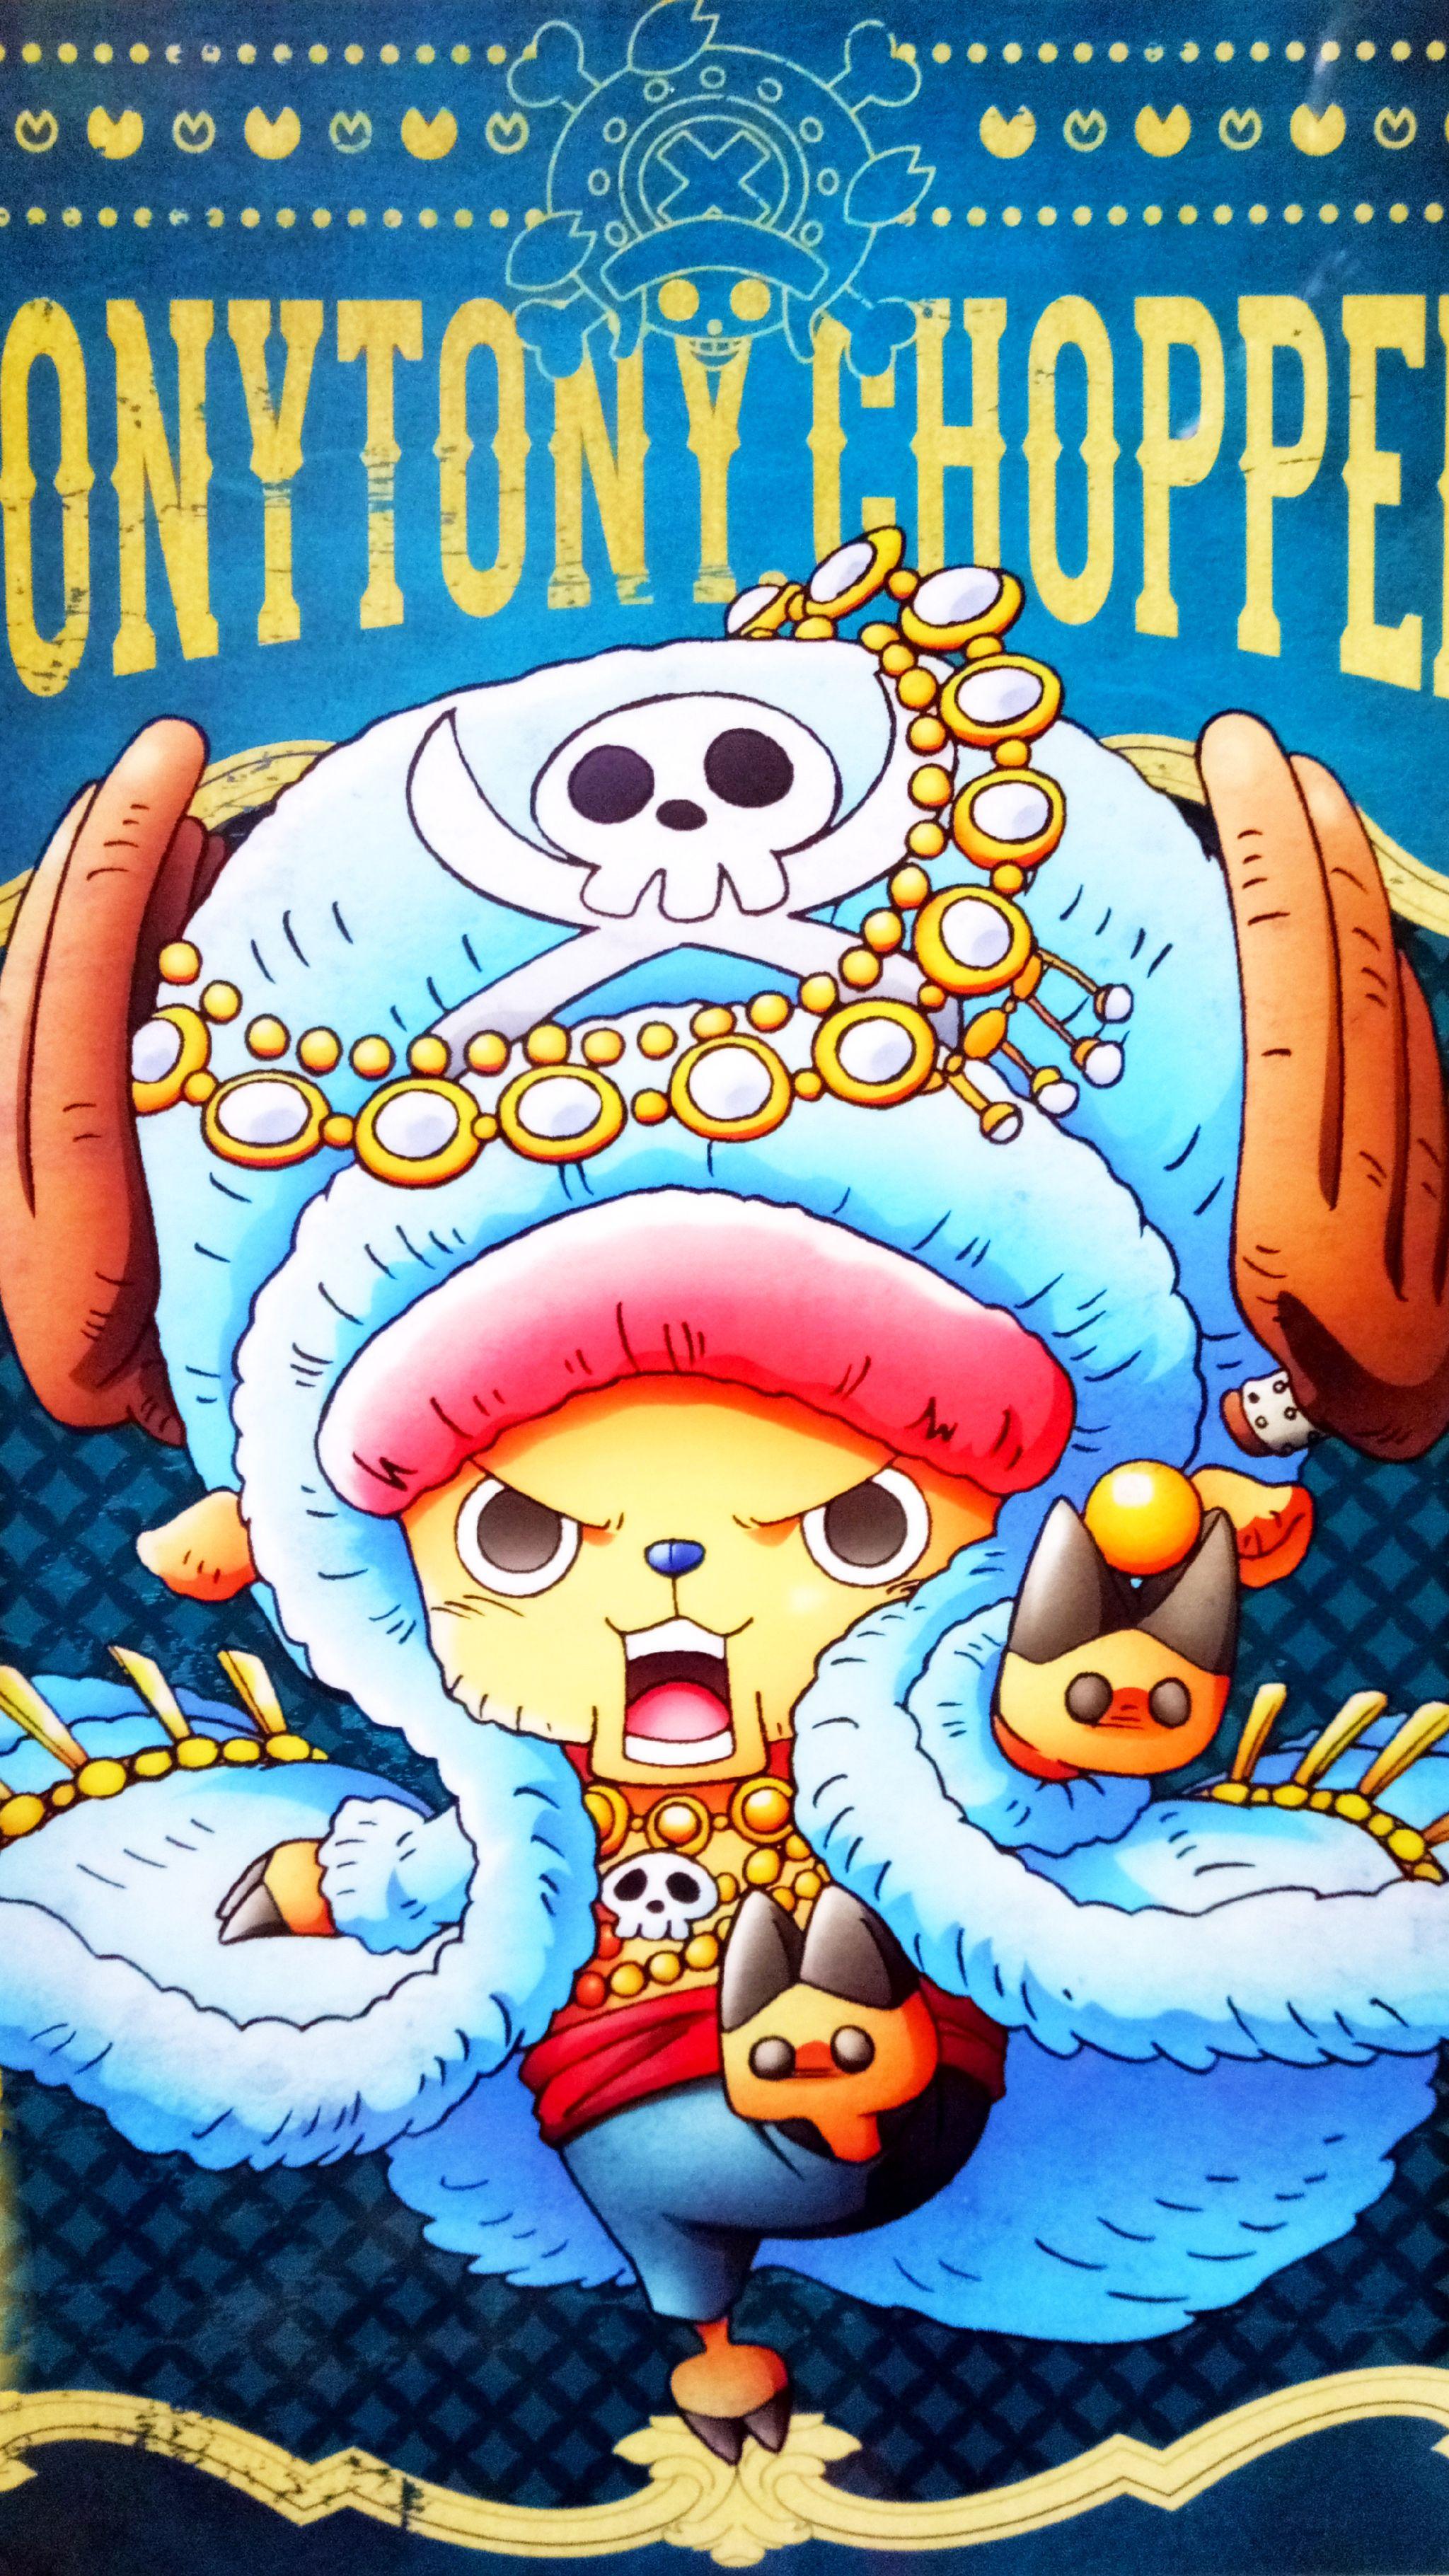 ONE PIECE, Tony Tony Chopper, One Piece Two Years Later